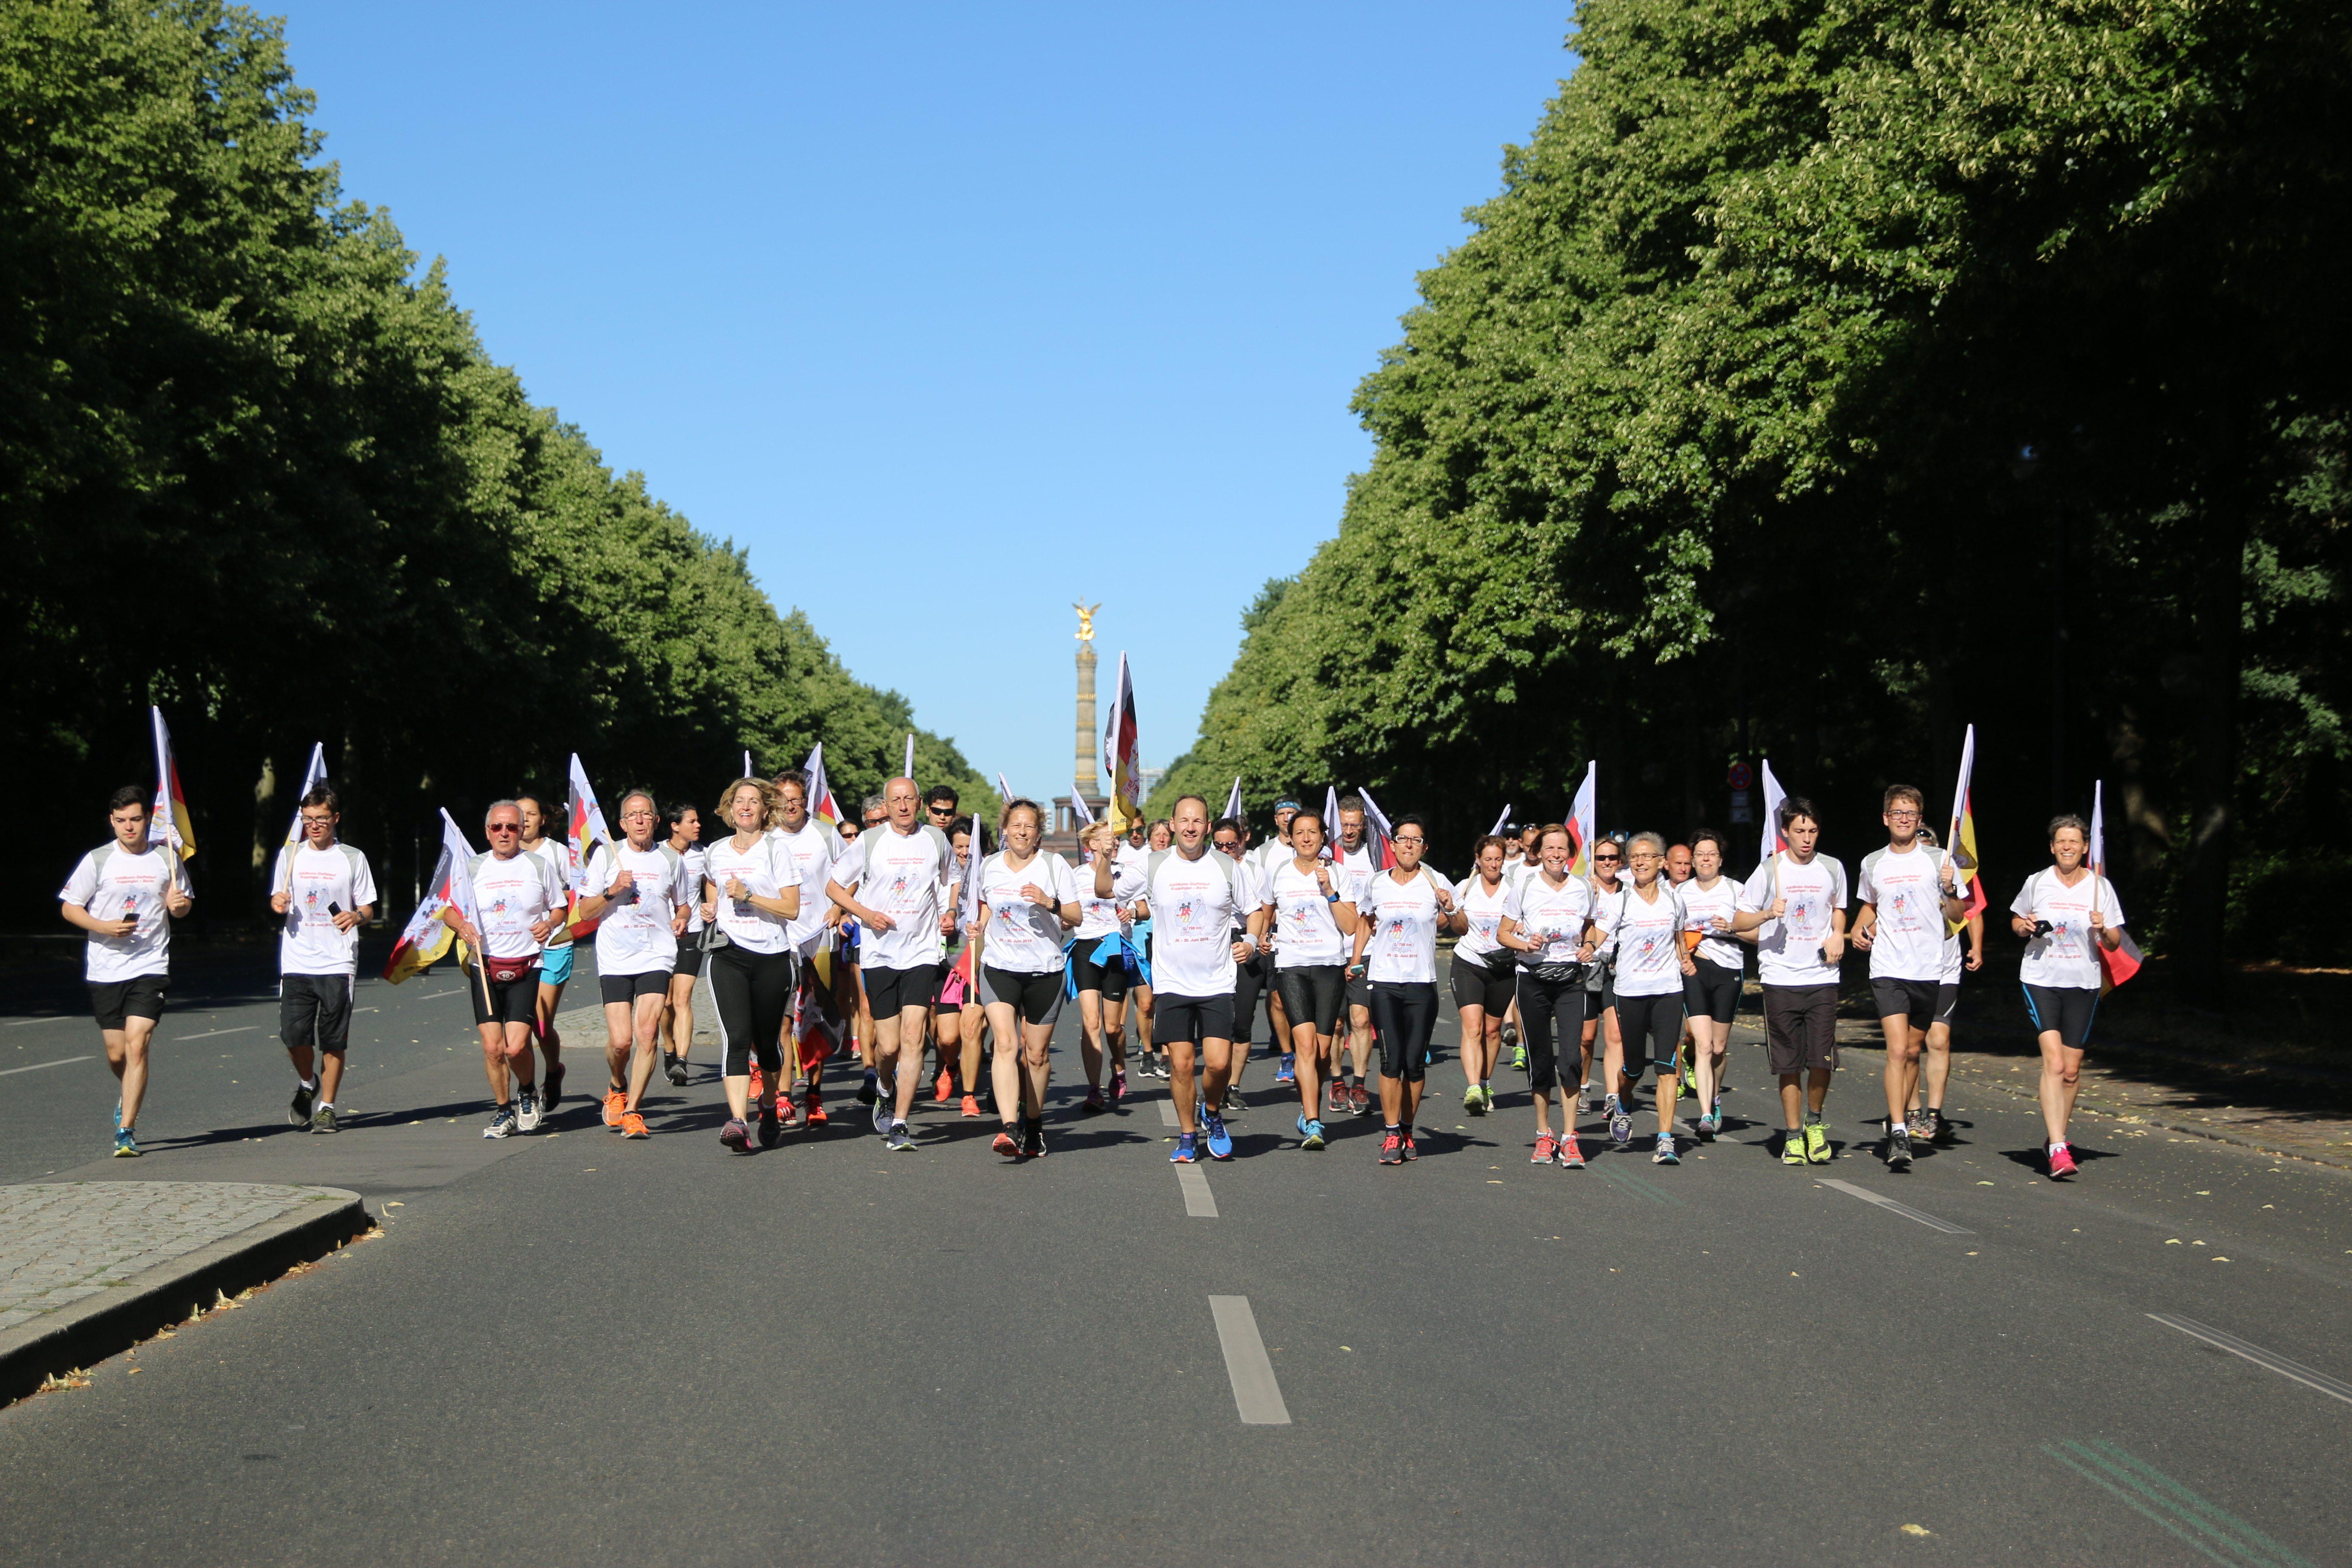 Staffellauf: Kurz vor dem Ziel in Berlin